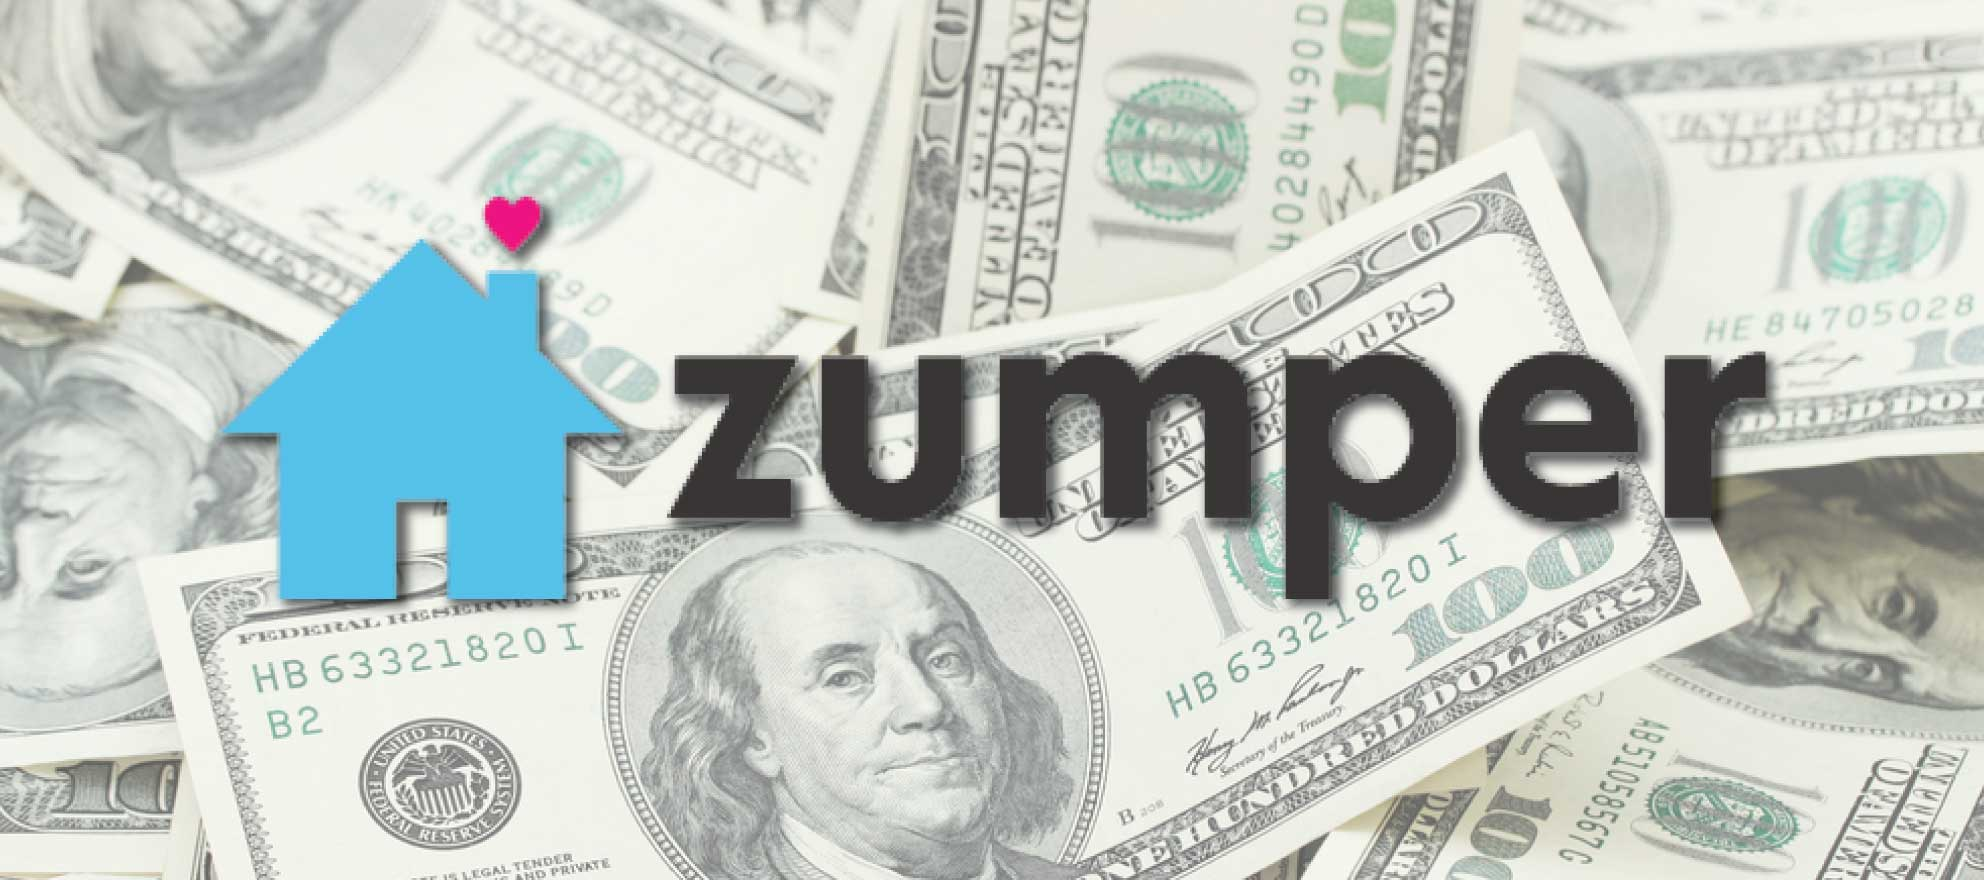 Rental site Zumper raises nearly $6.4M